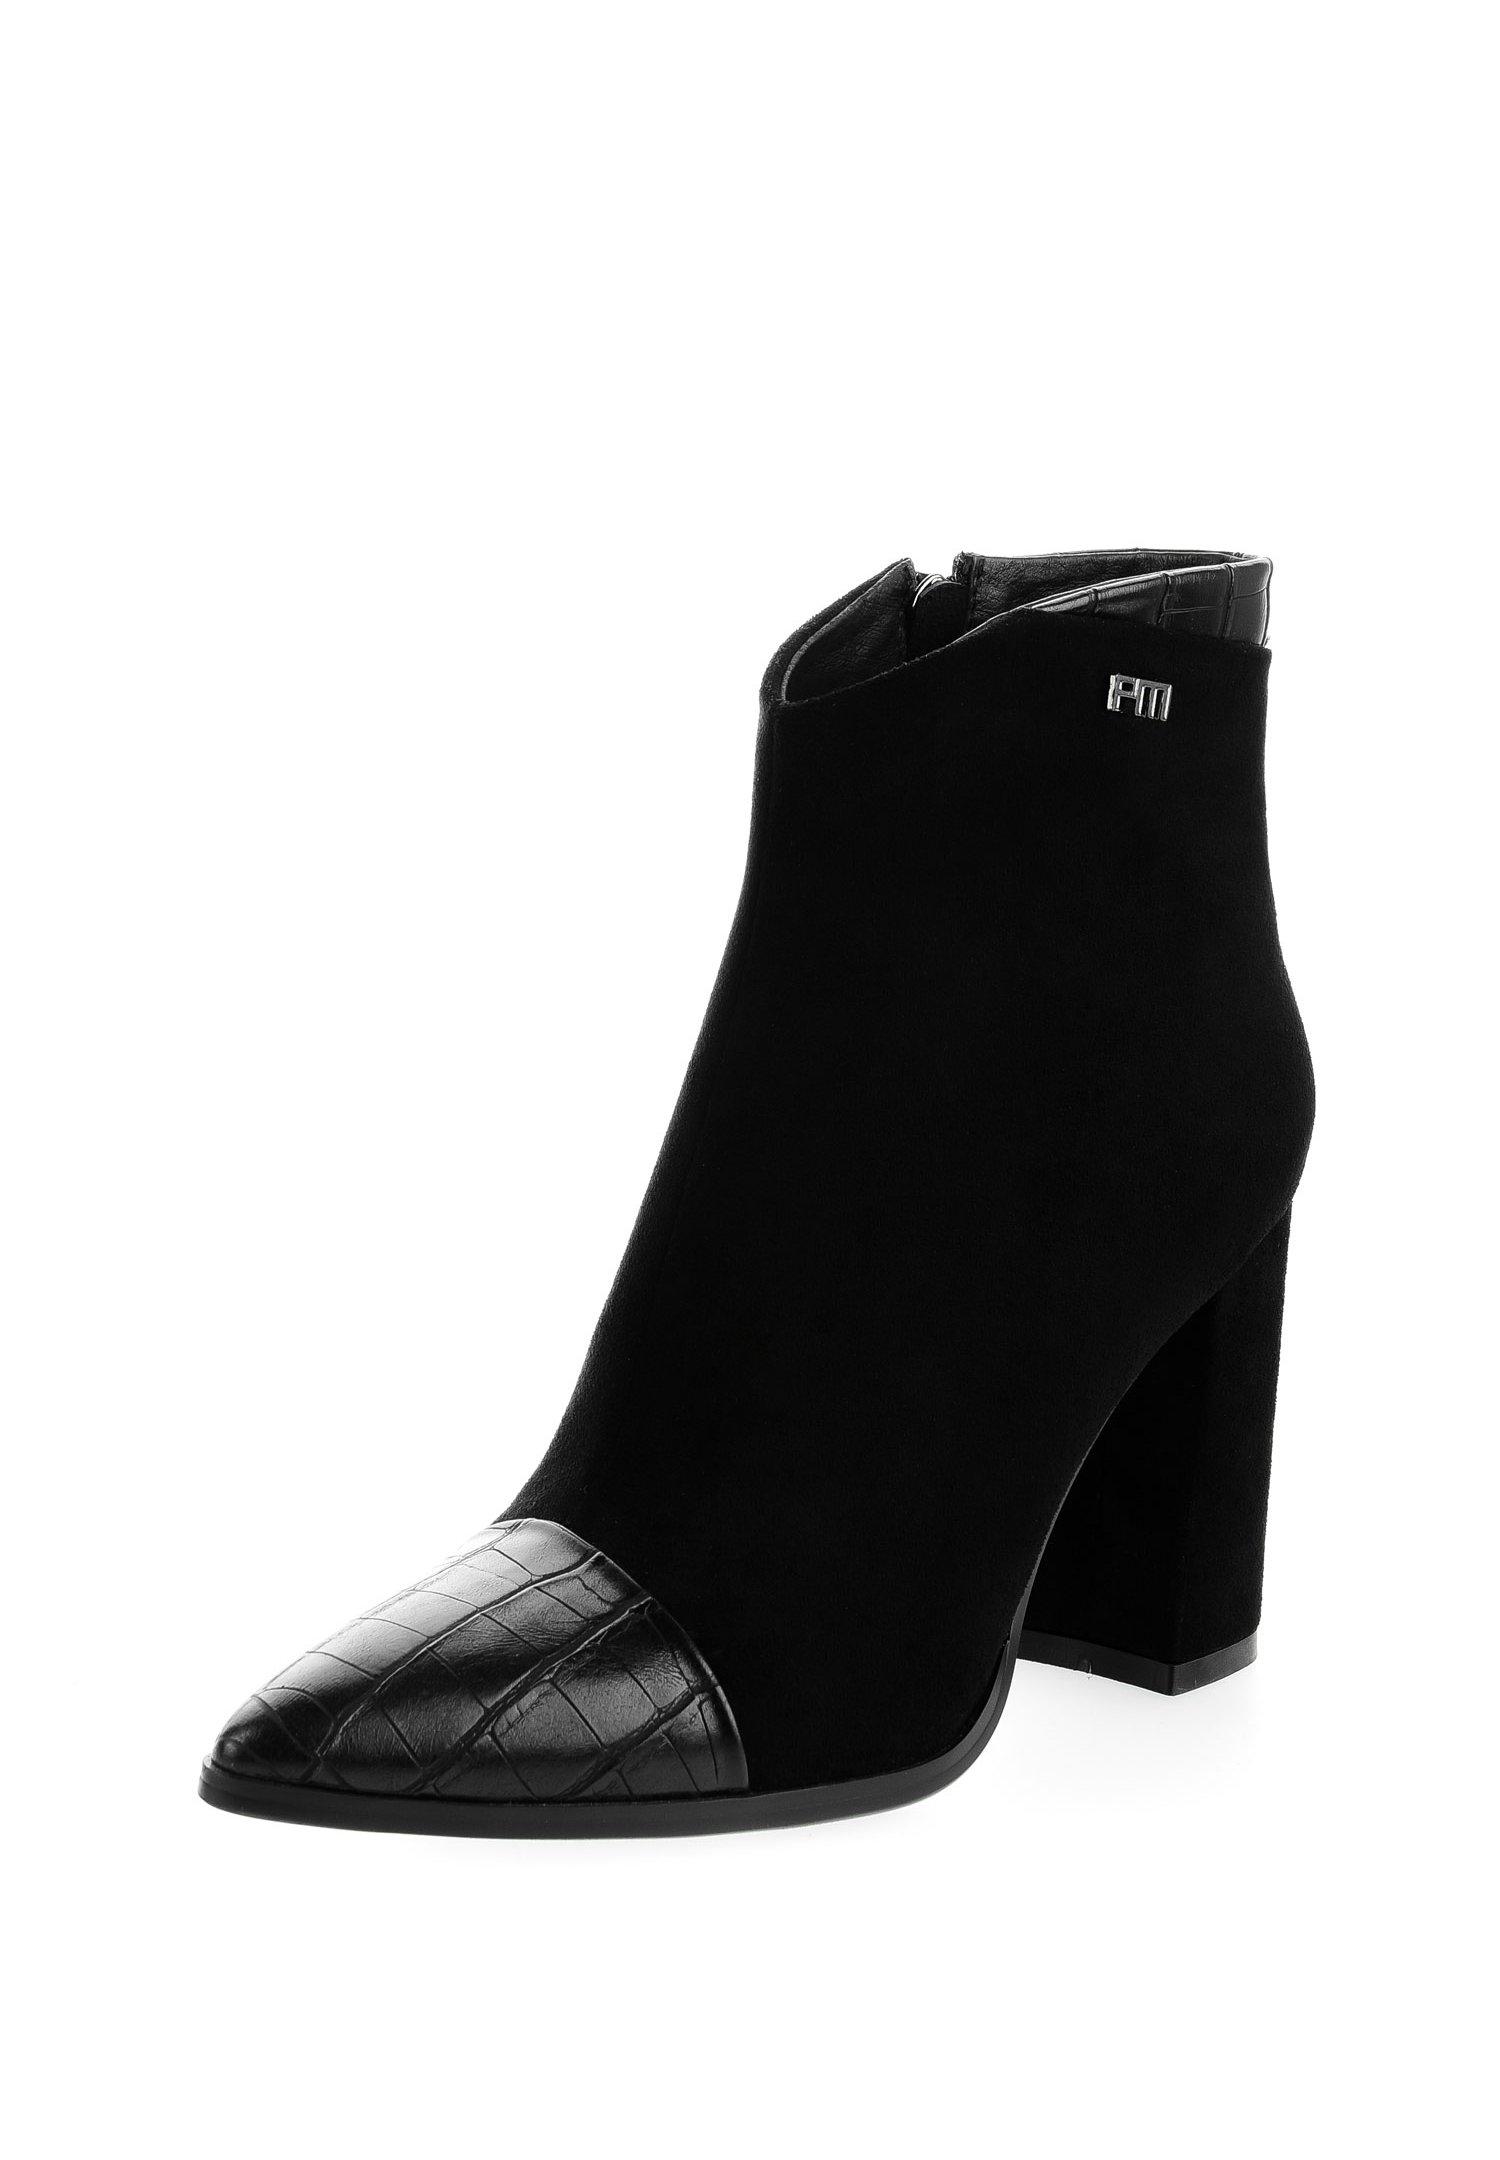 Prima Moda Sabbioneta - Højhælede Støvletter Black